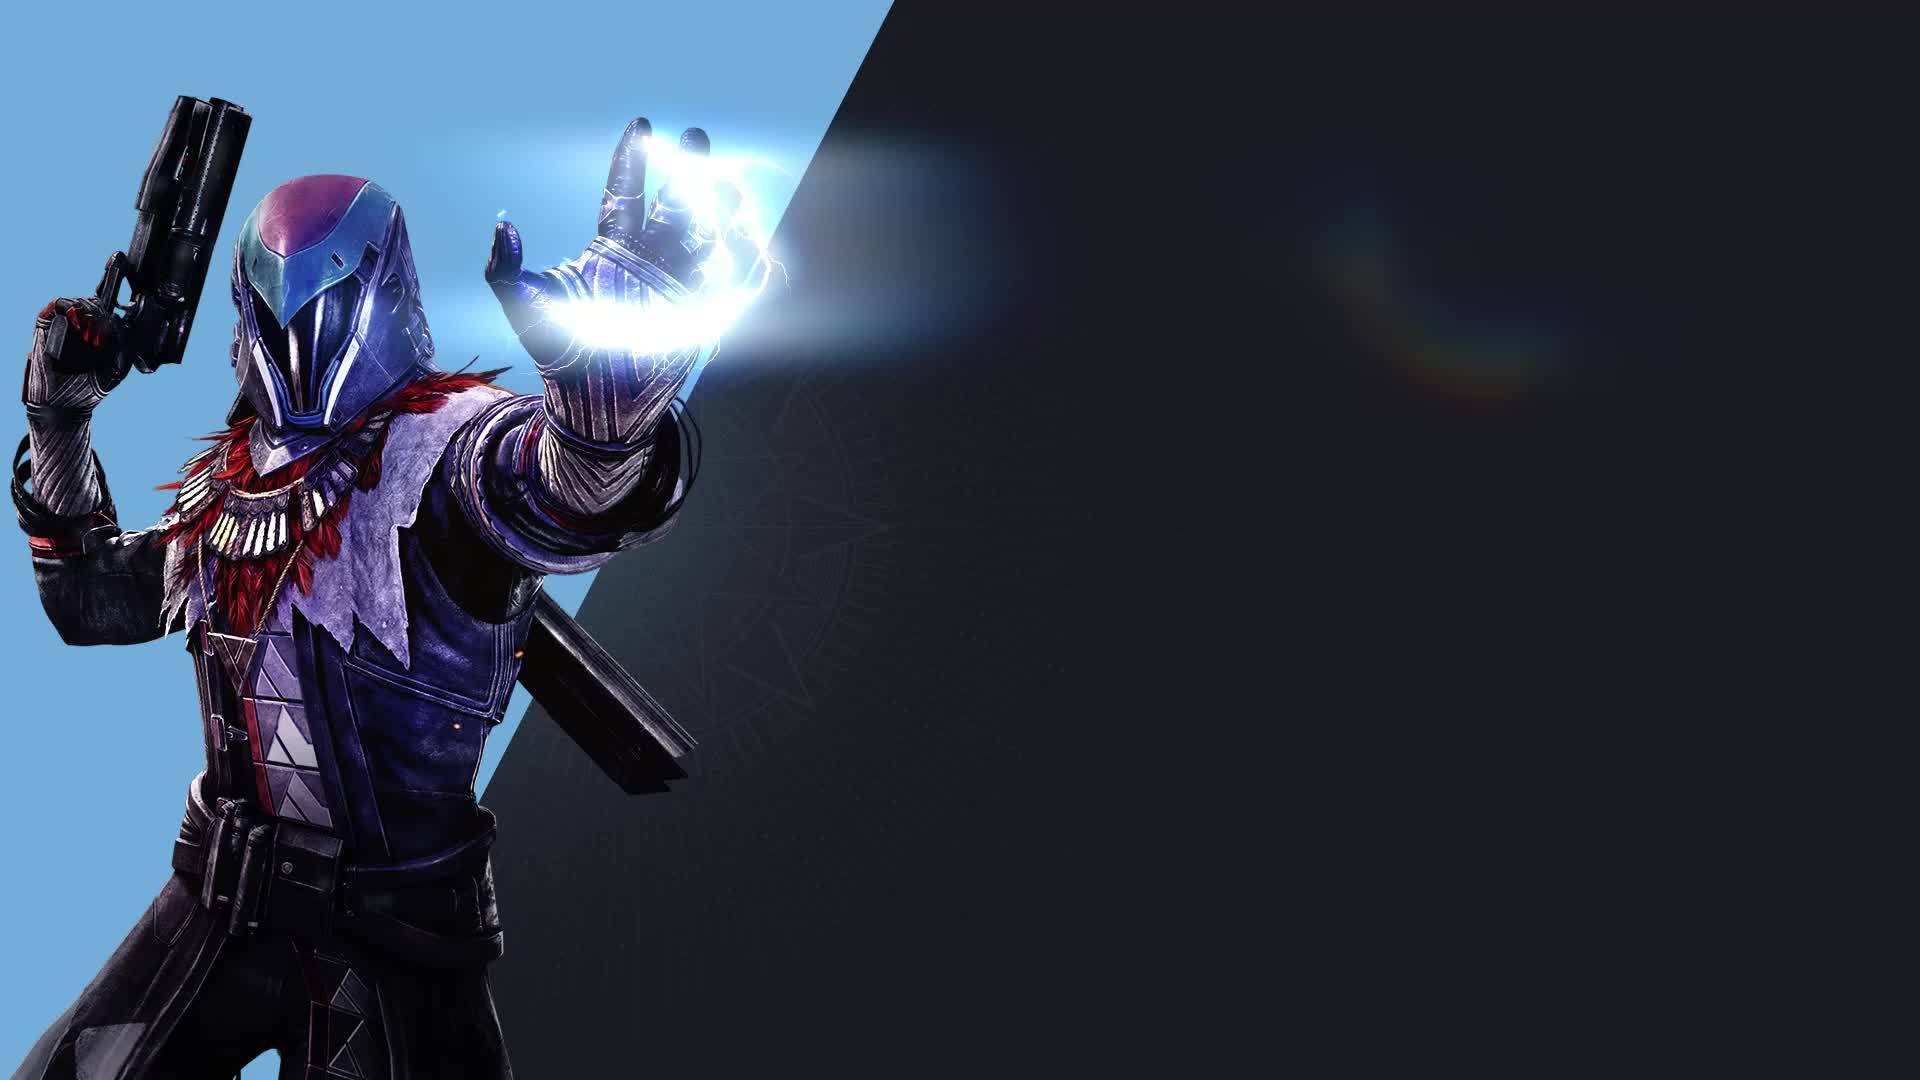 destinythegame, Stormcaller GIFs